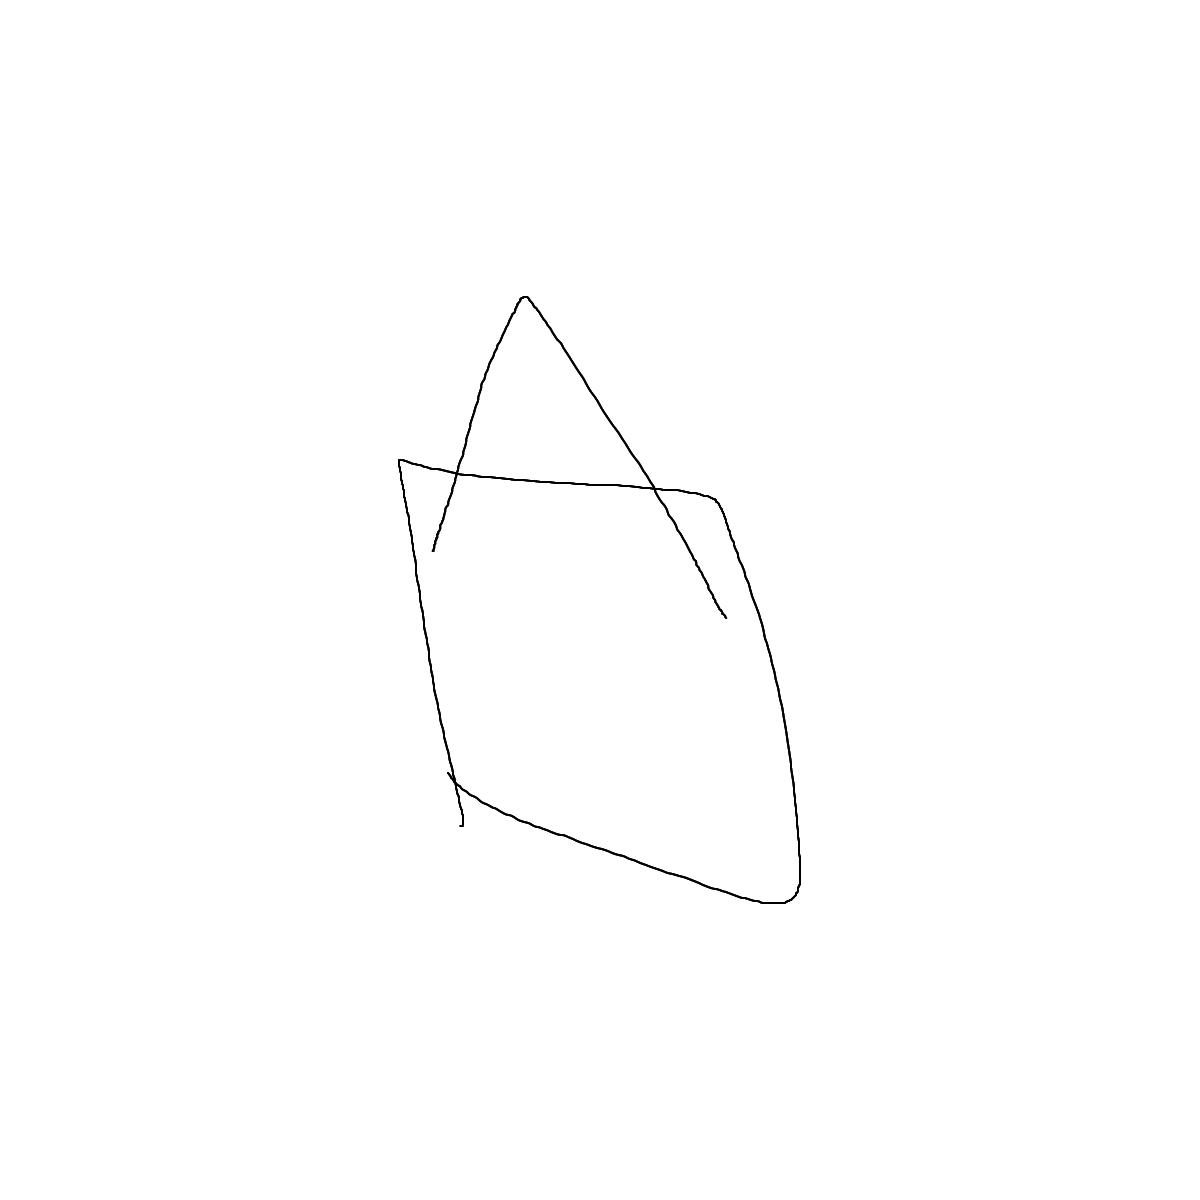 BAAAM drawing#915 lat:-32.0738525390625000lng: 115.7548904418945300